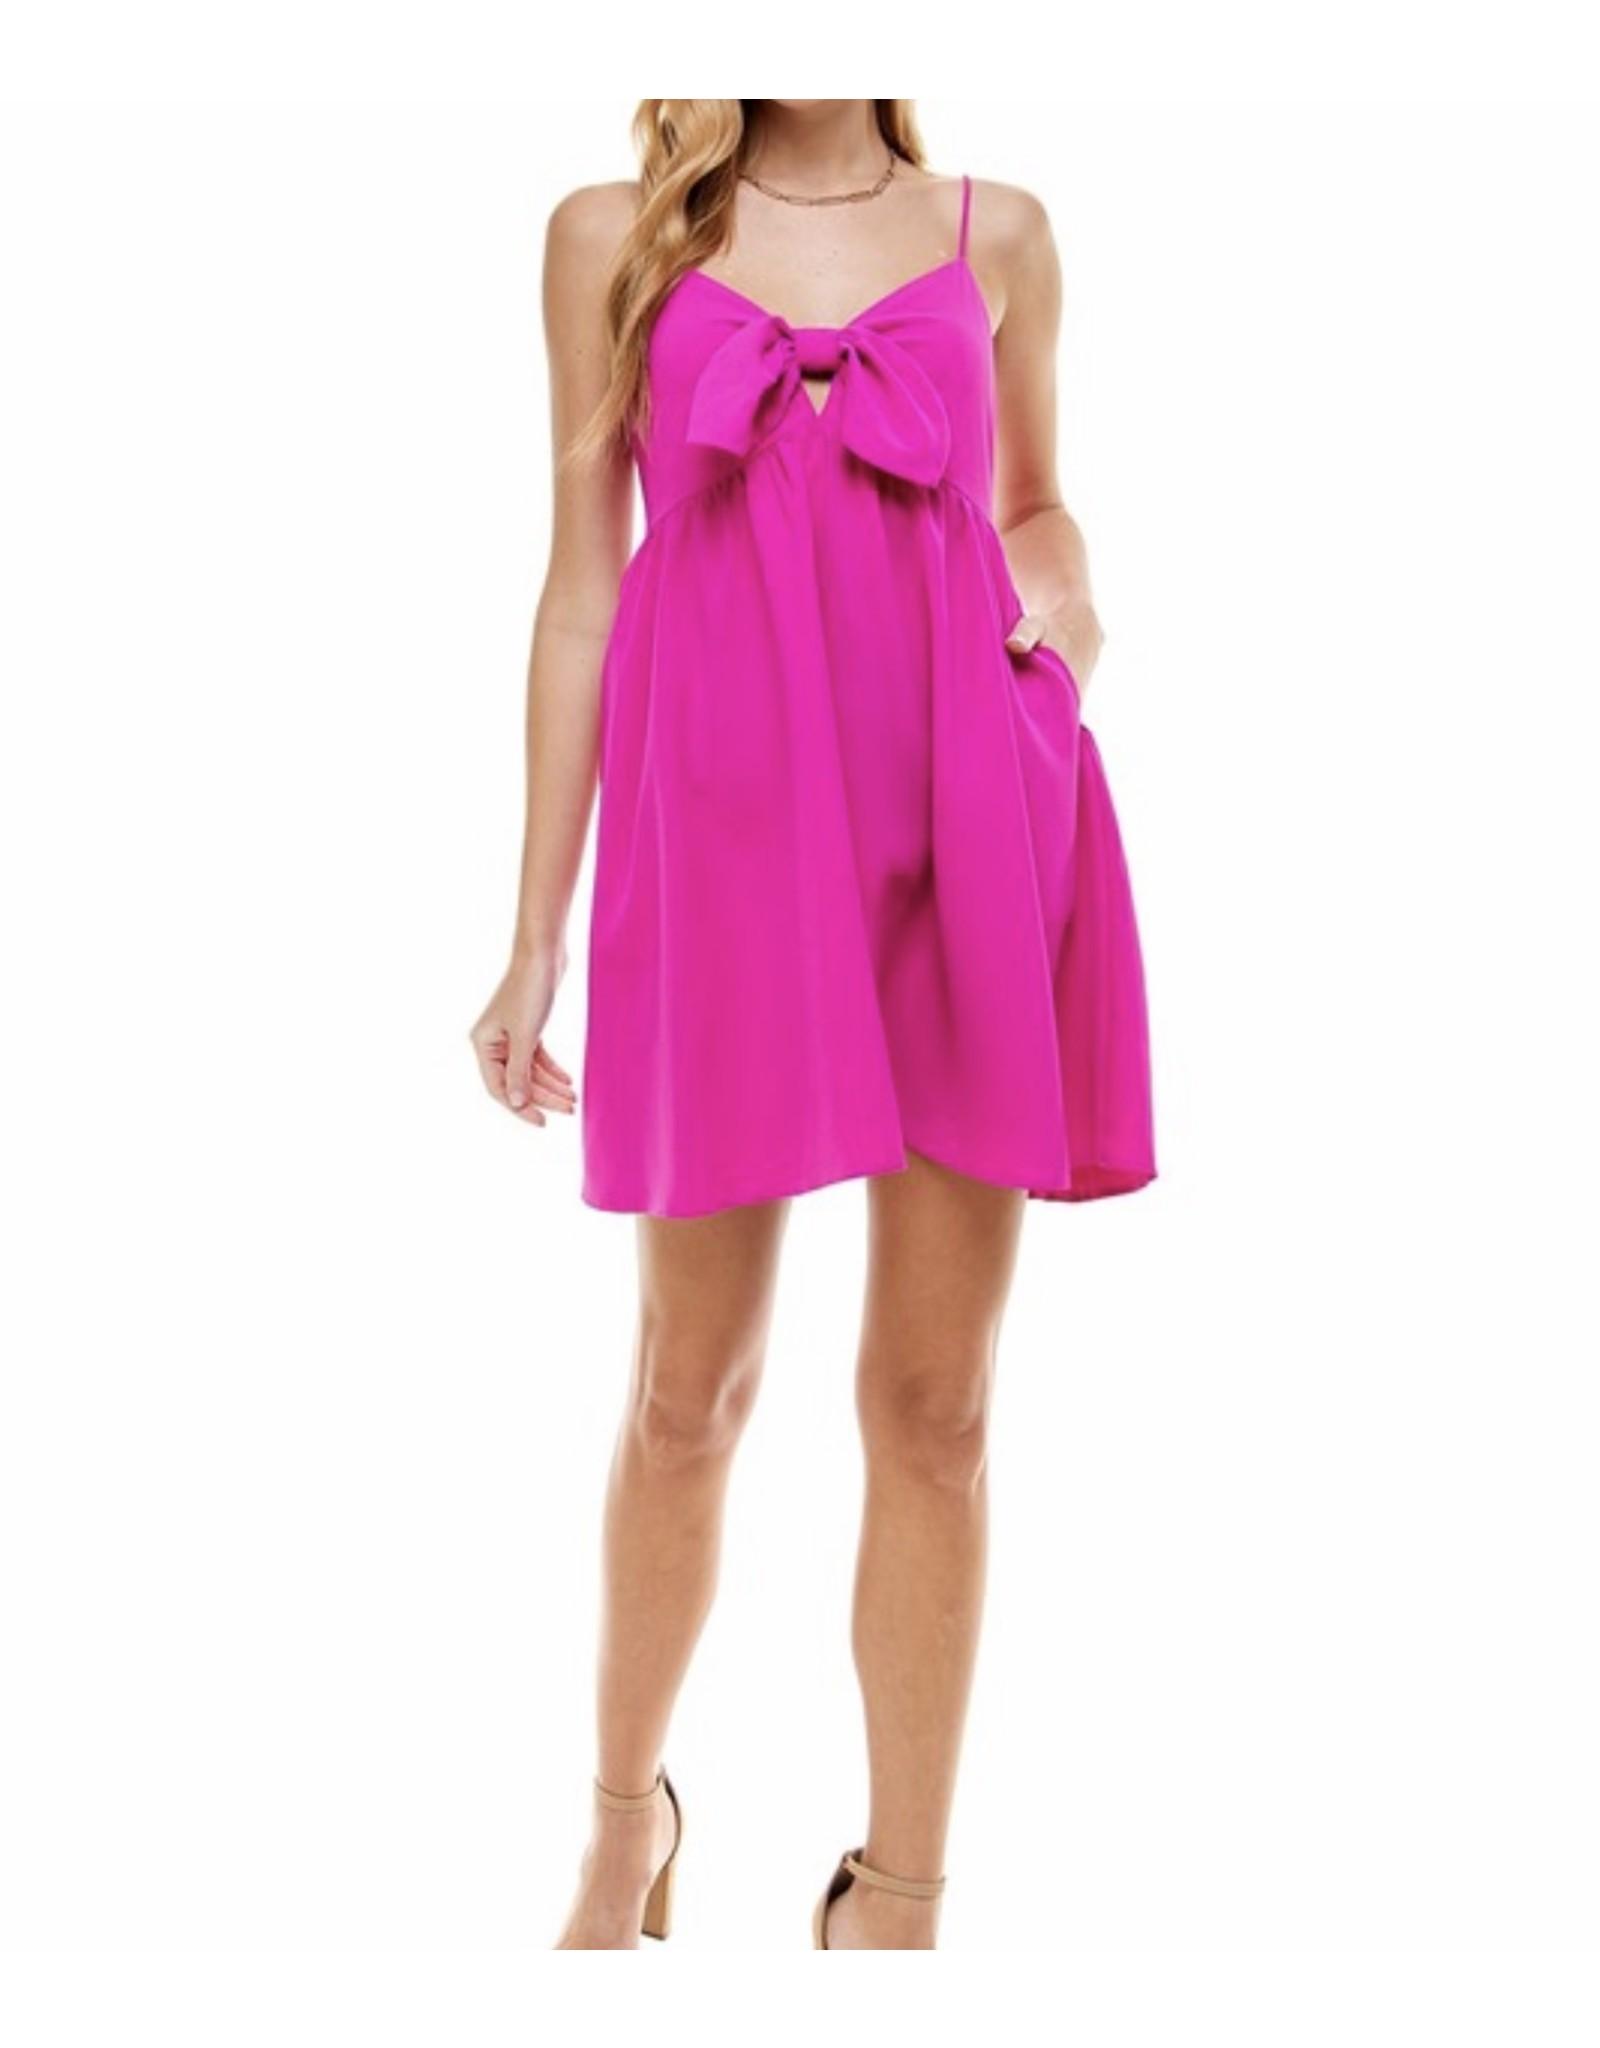 Bow Detail Dress - Magenta